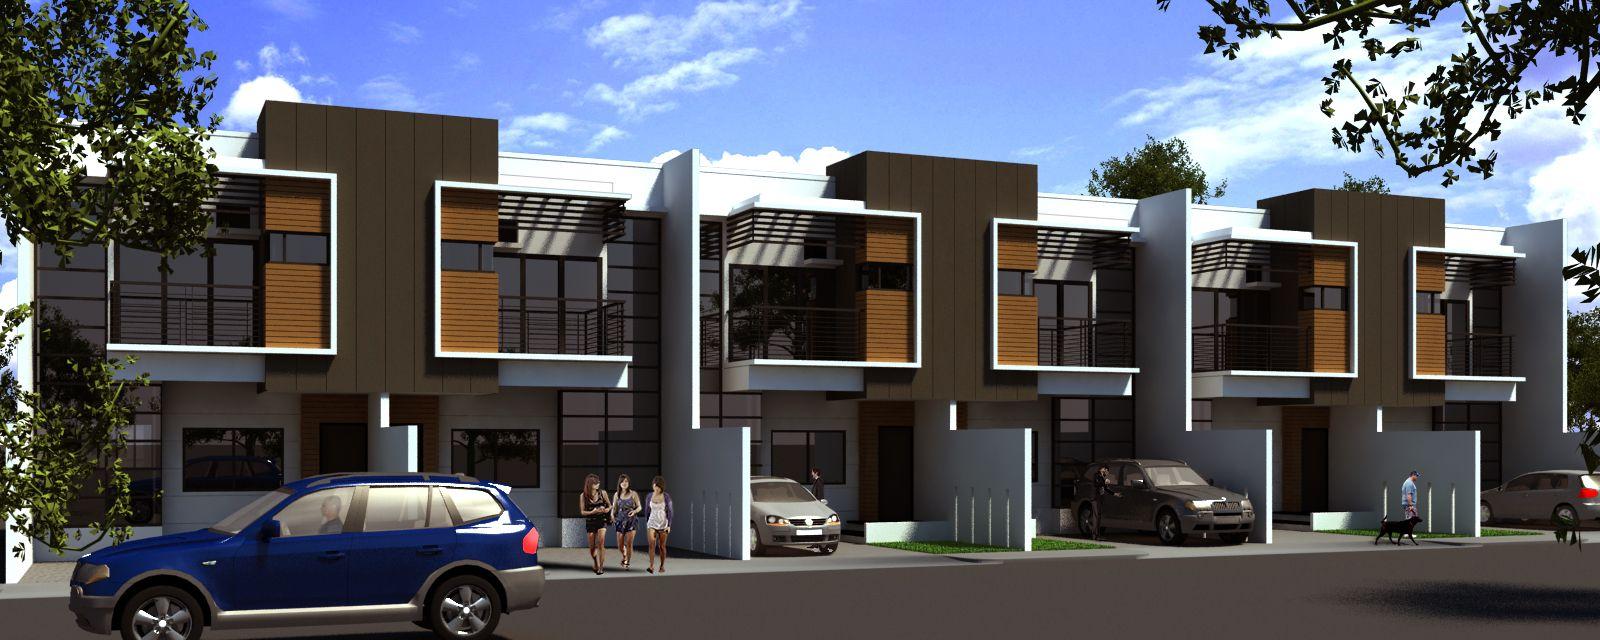 Low Budget Row House V2 By Hupao Deviantart Com On DeviantART